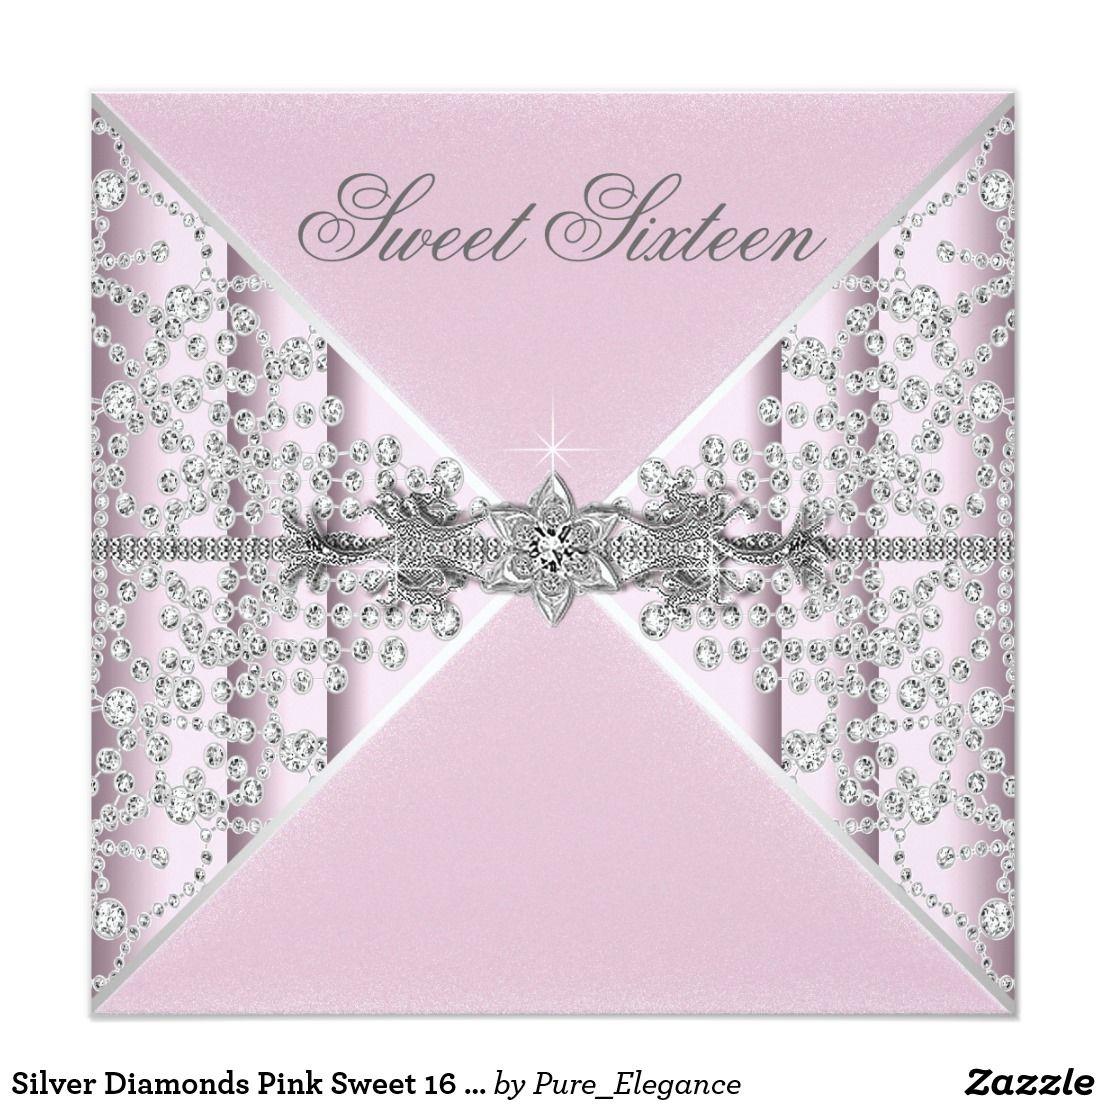 Silver Diamonds Pink Sweet 16 Birthday Party Invitation | Pinterest ...